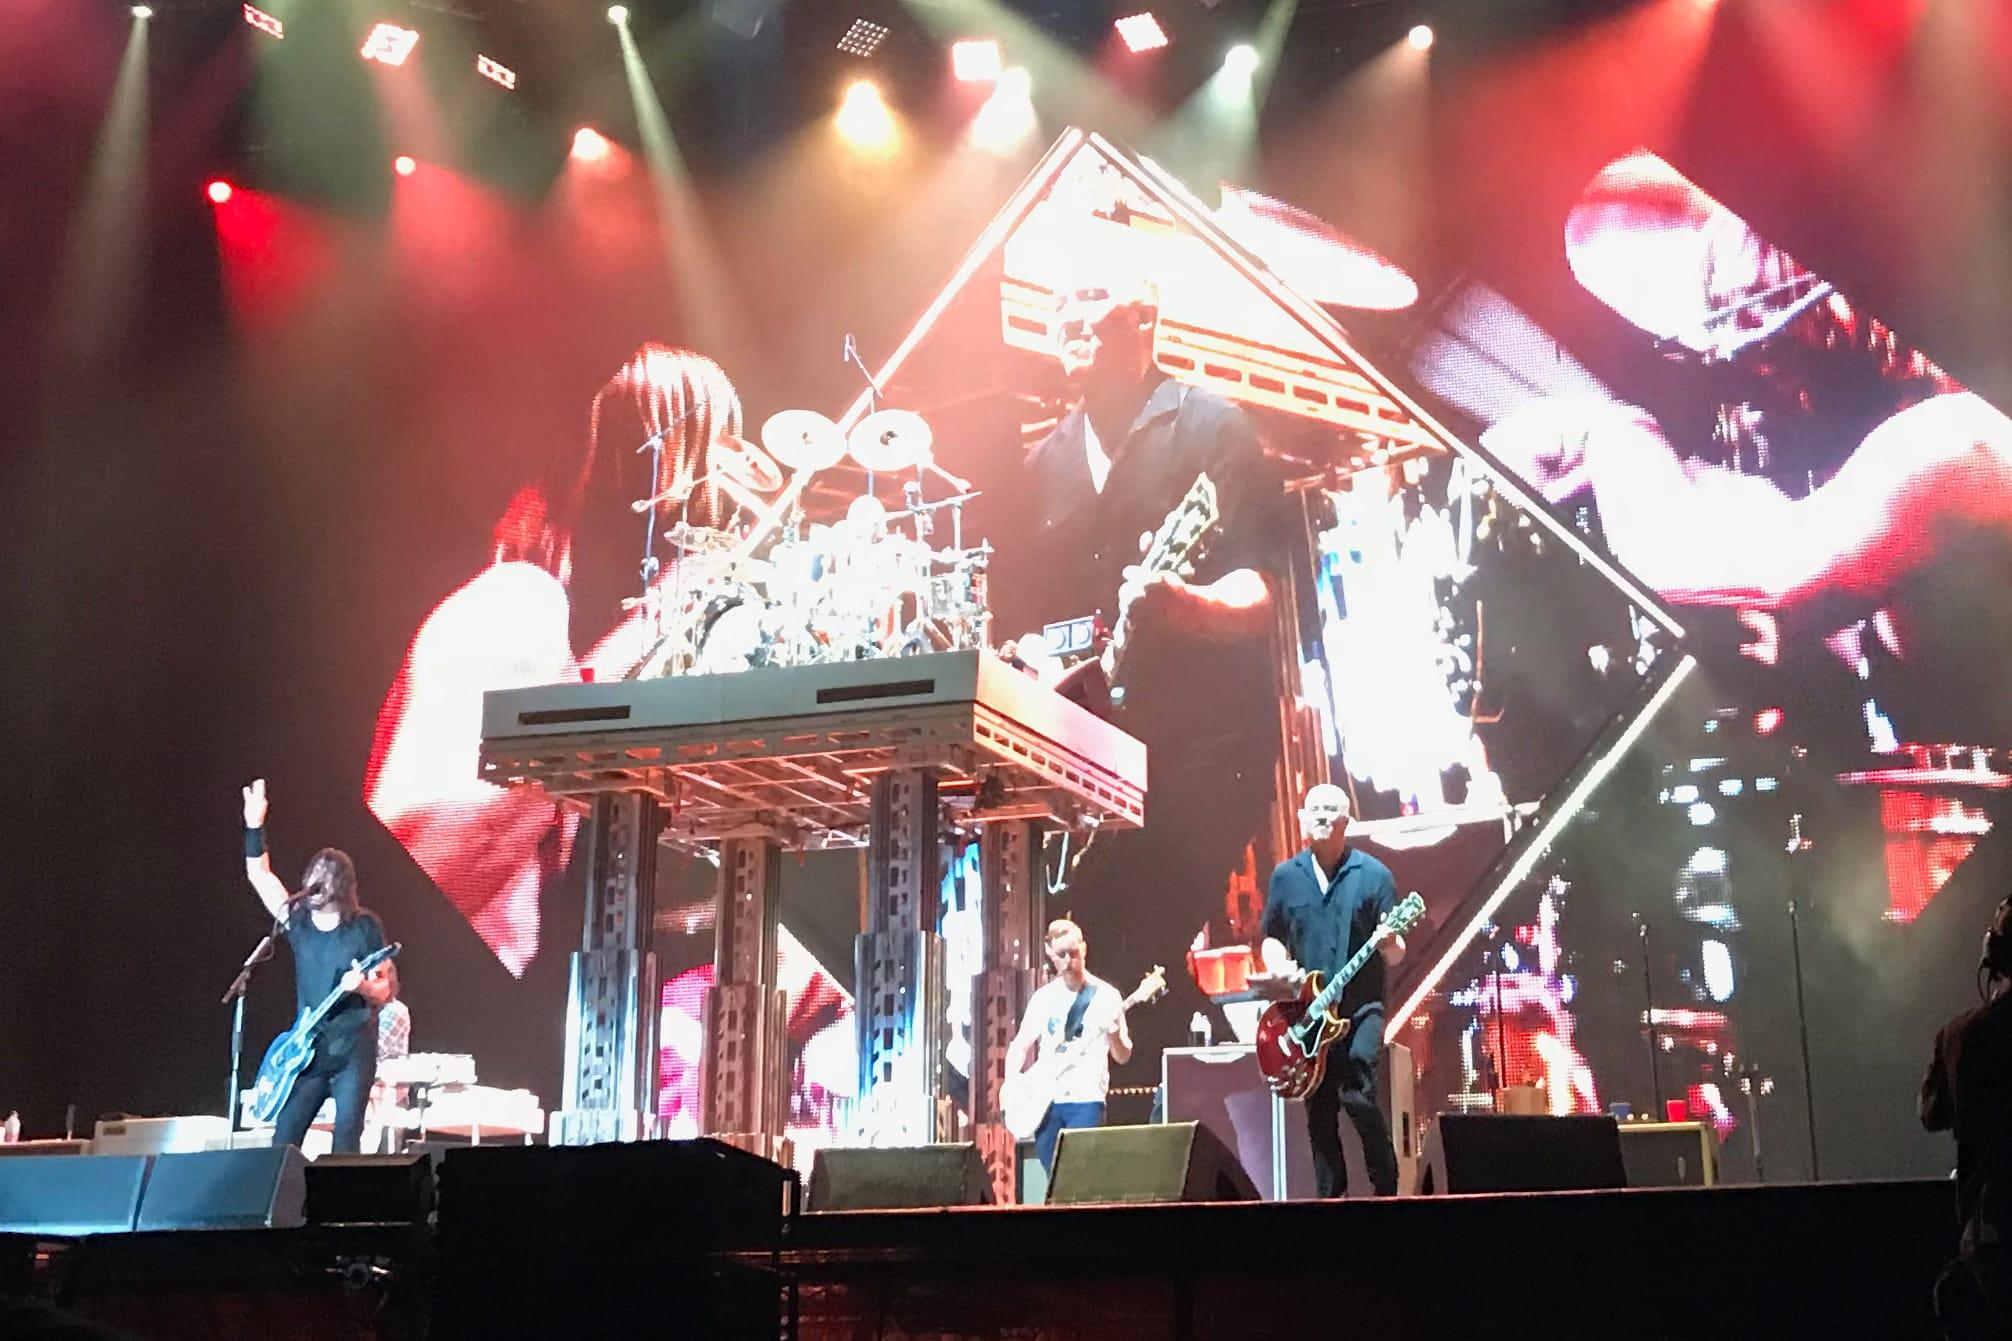 Foo Fighters concert lighting Wrigley Field